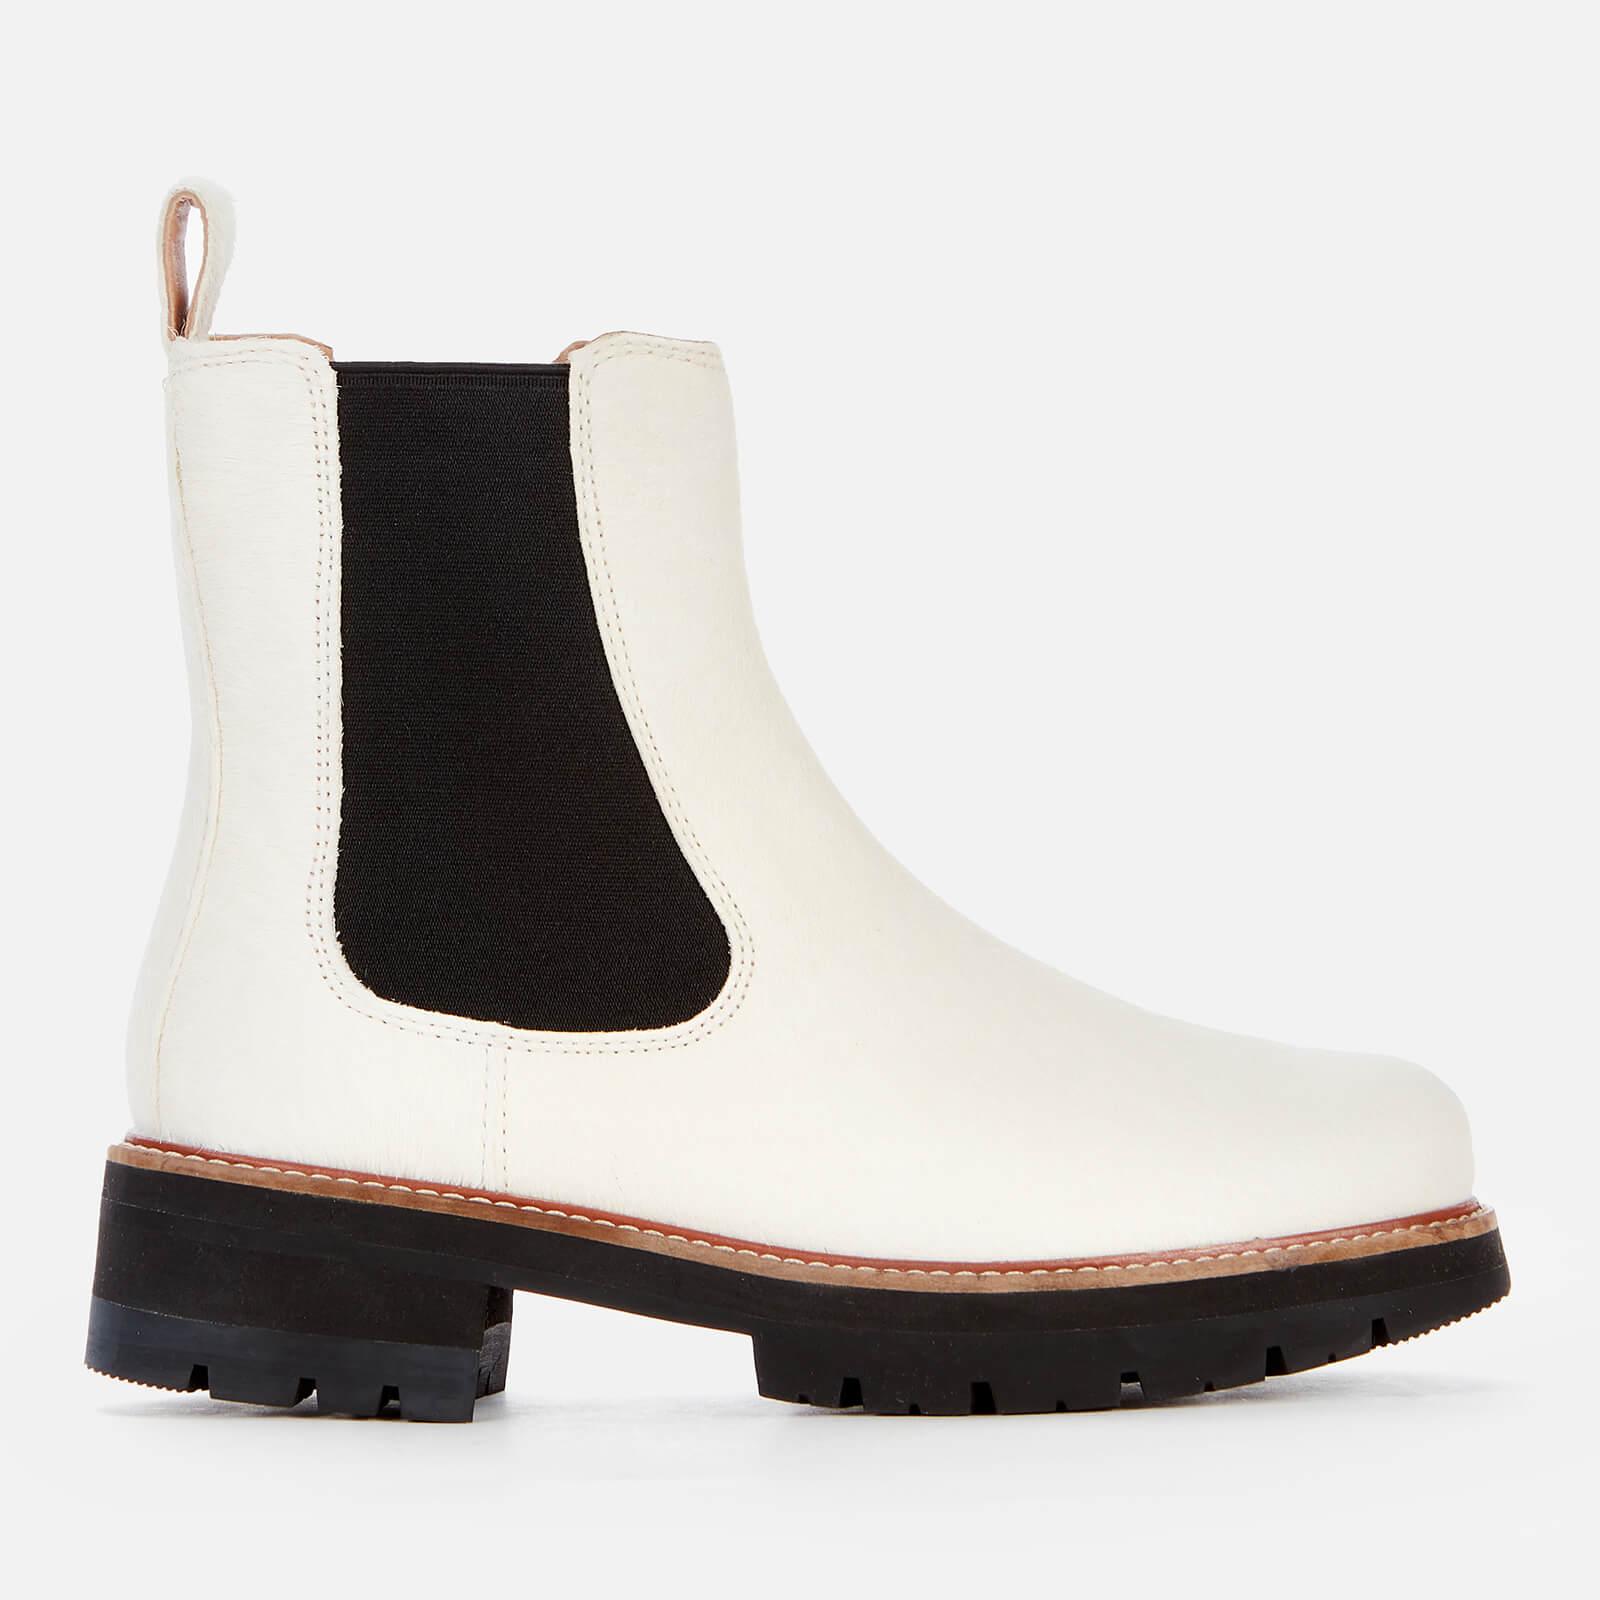 Clarks Women's Orianna Top Chelsea Boots - White Interest - Uk 3